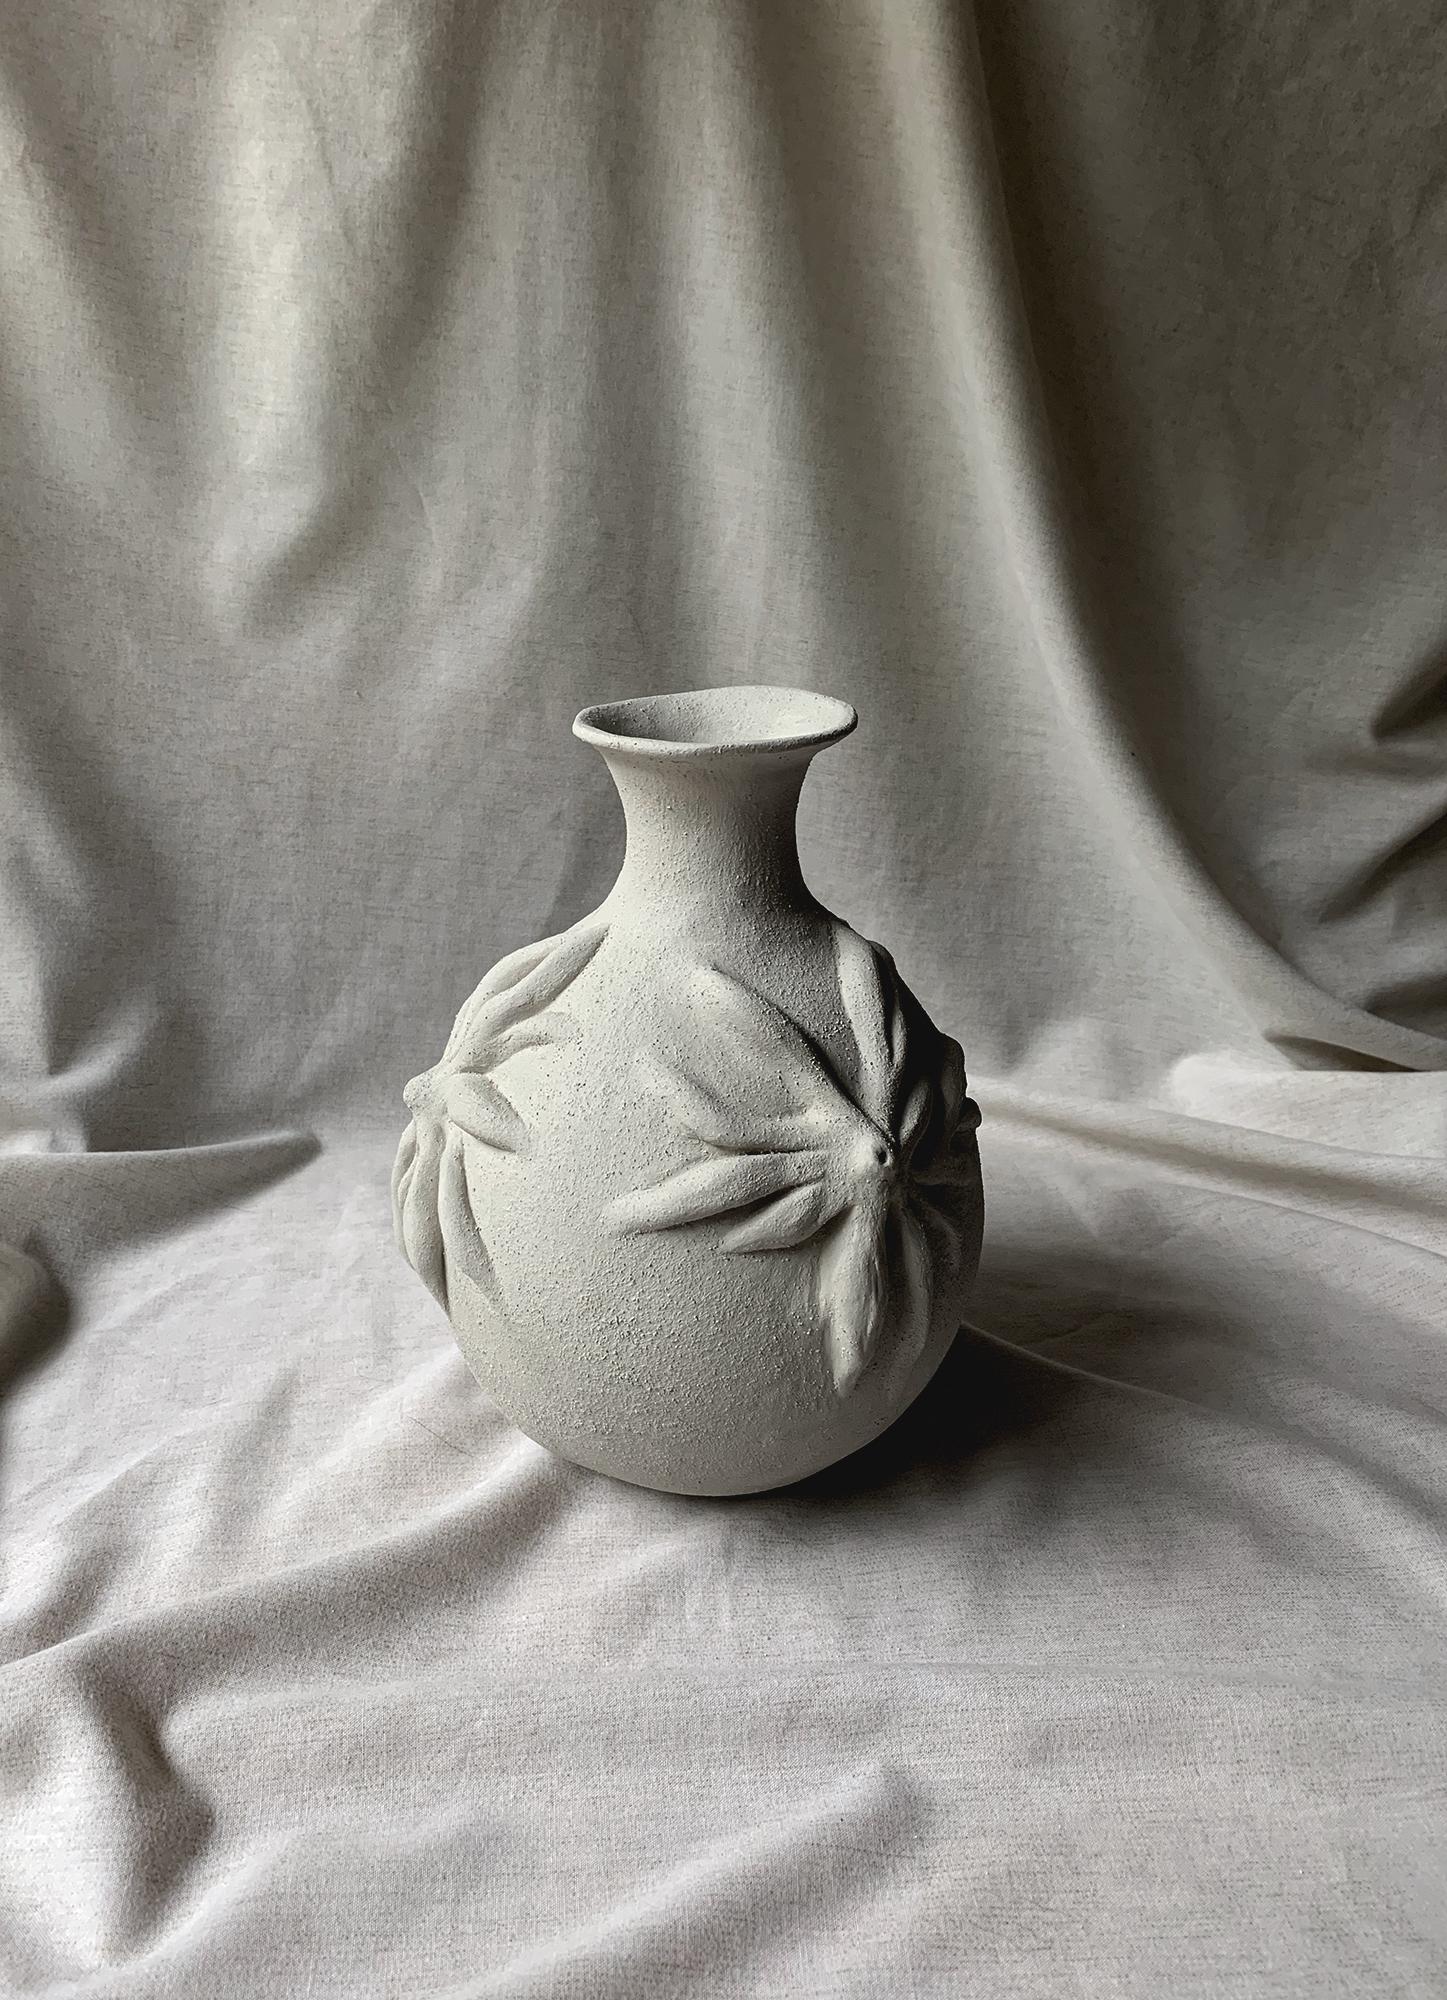 Emma Llorente Palacio, Mammary glands (Ritual vessel), 2020